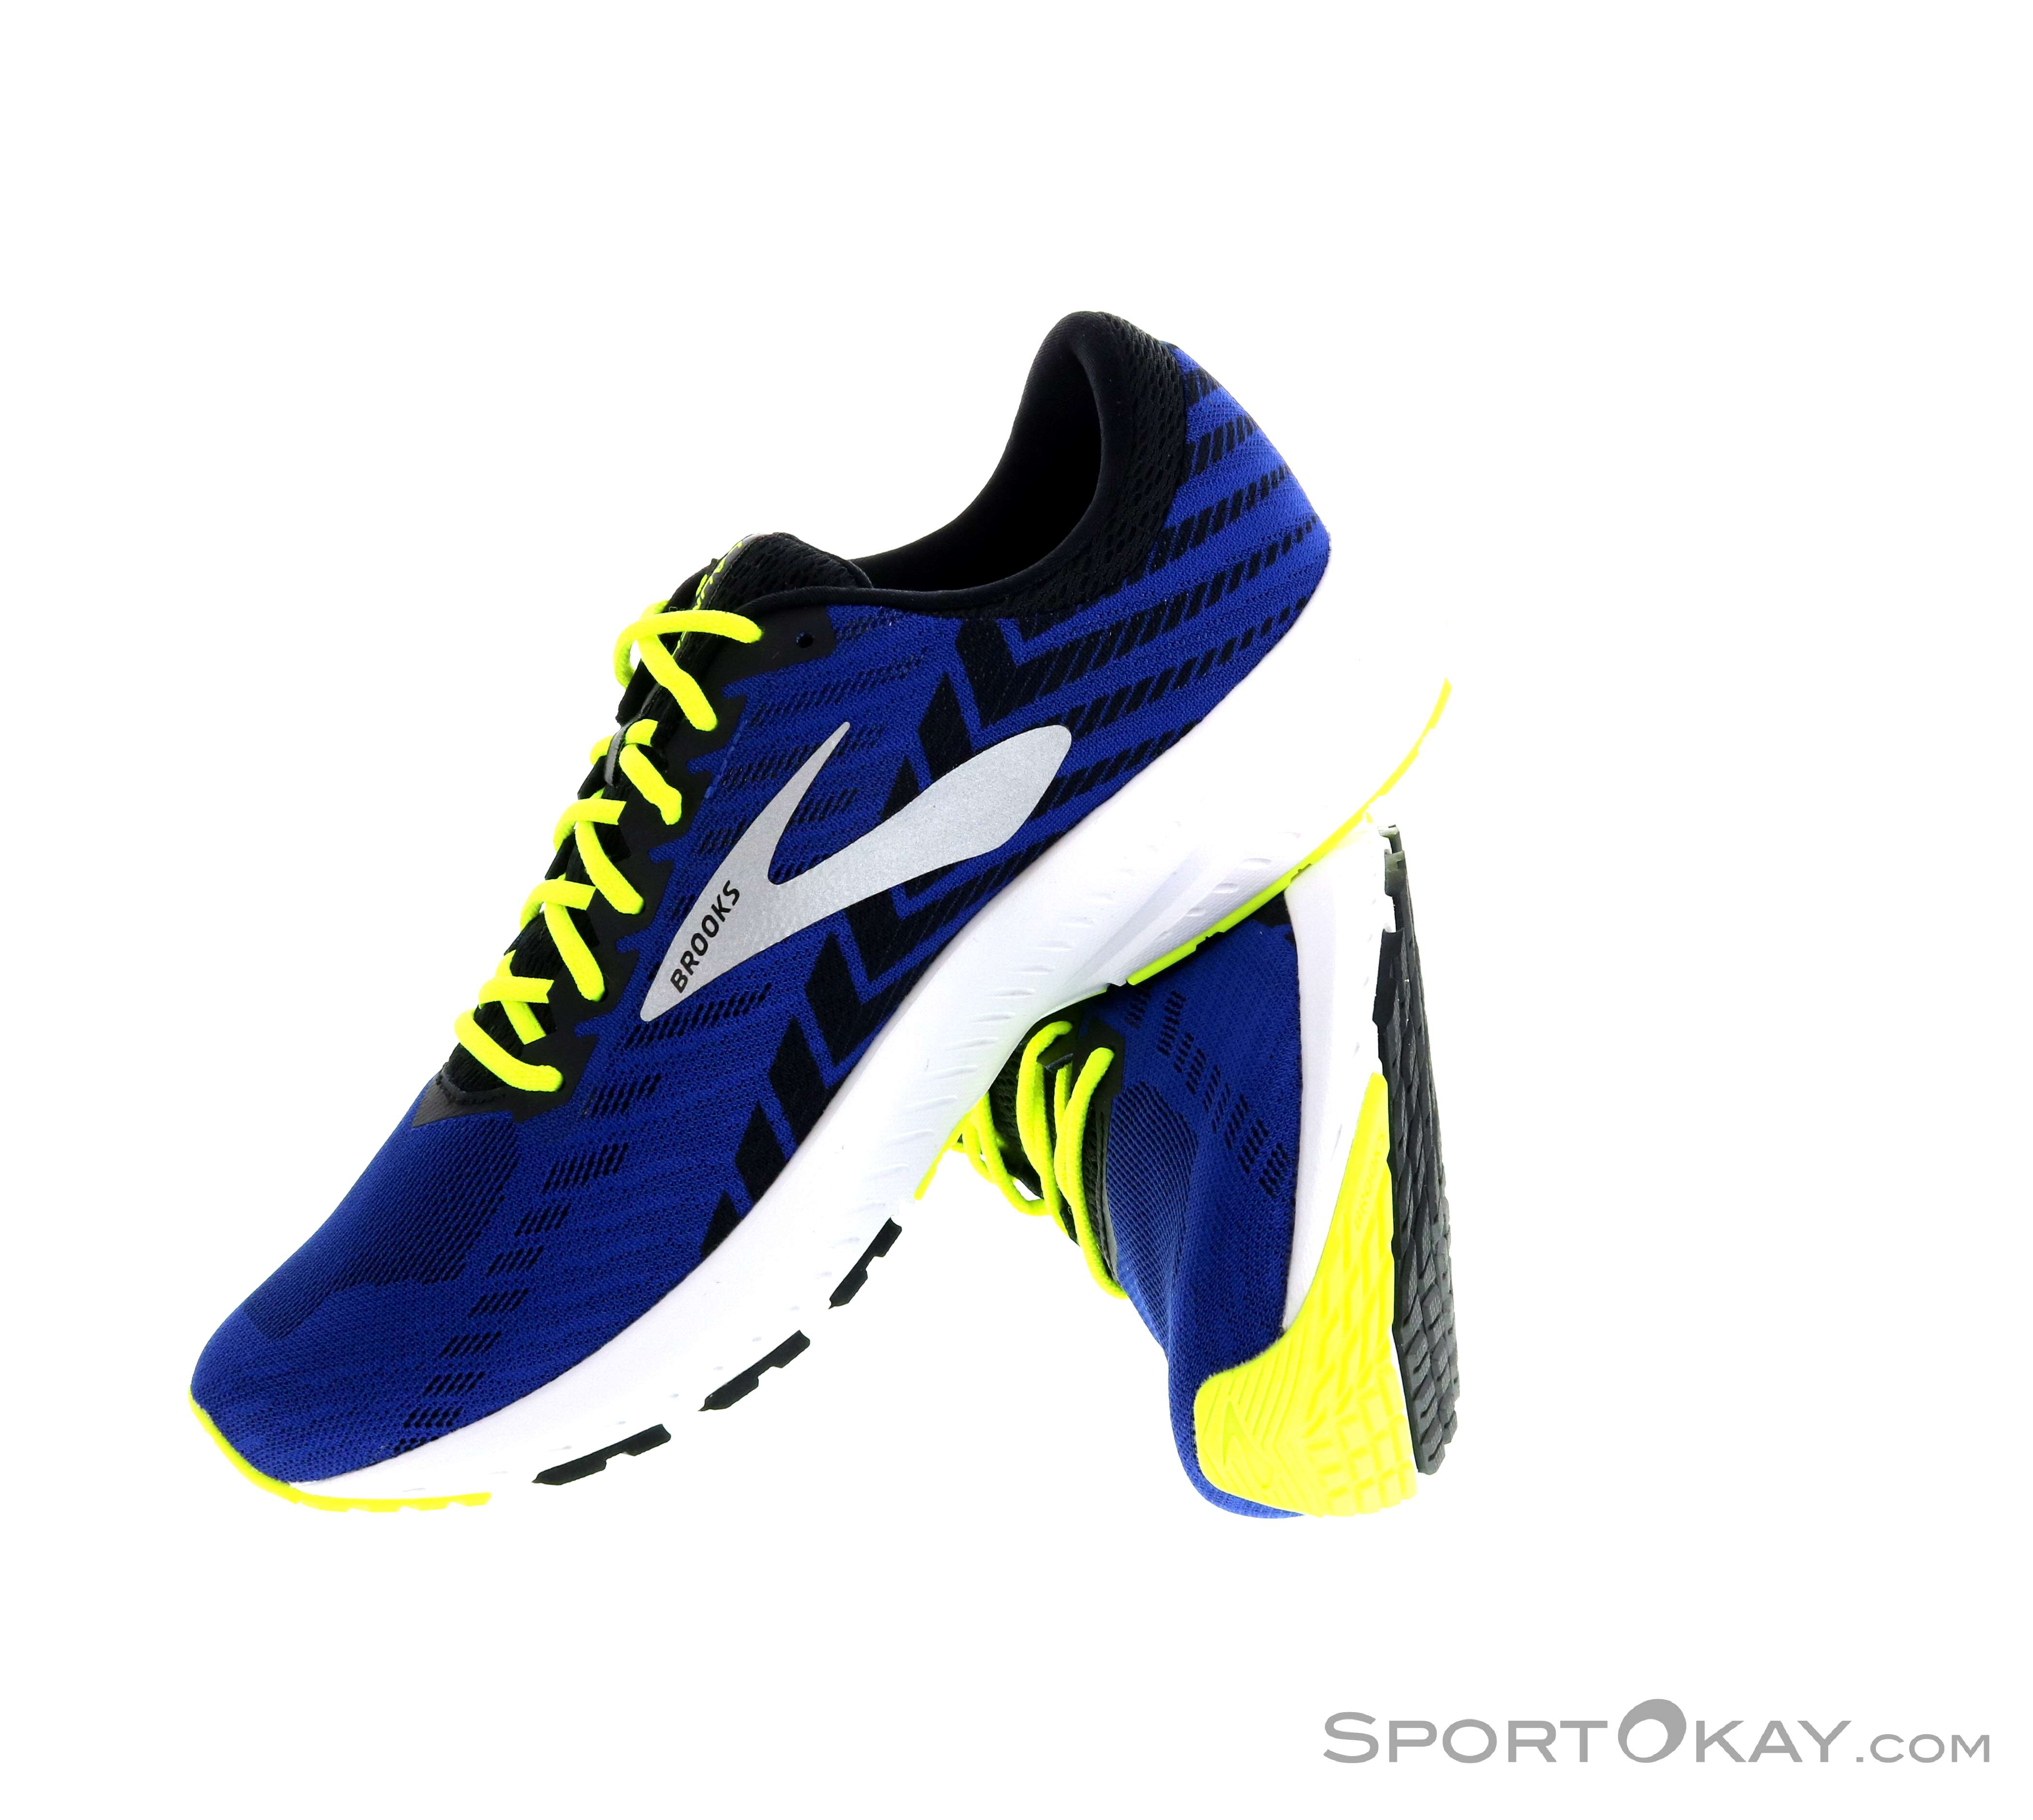 3b27de83c3e Brooks Launch 6 Mens Running Shoes - Running Shoes - Running Shoes ...